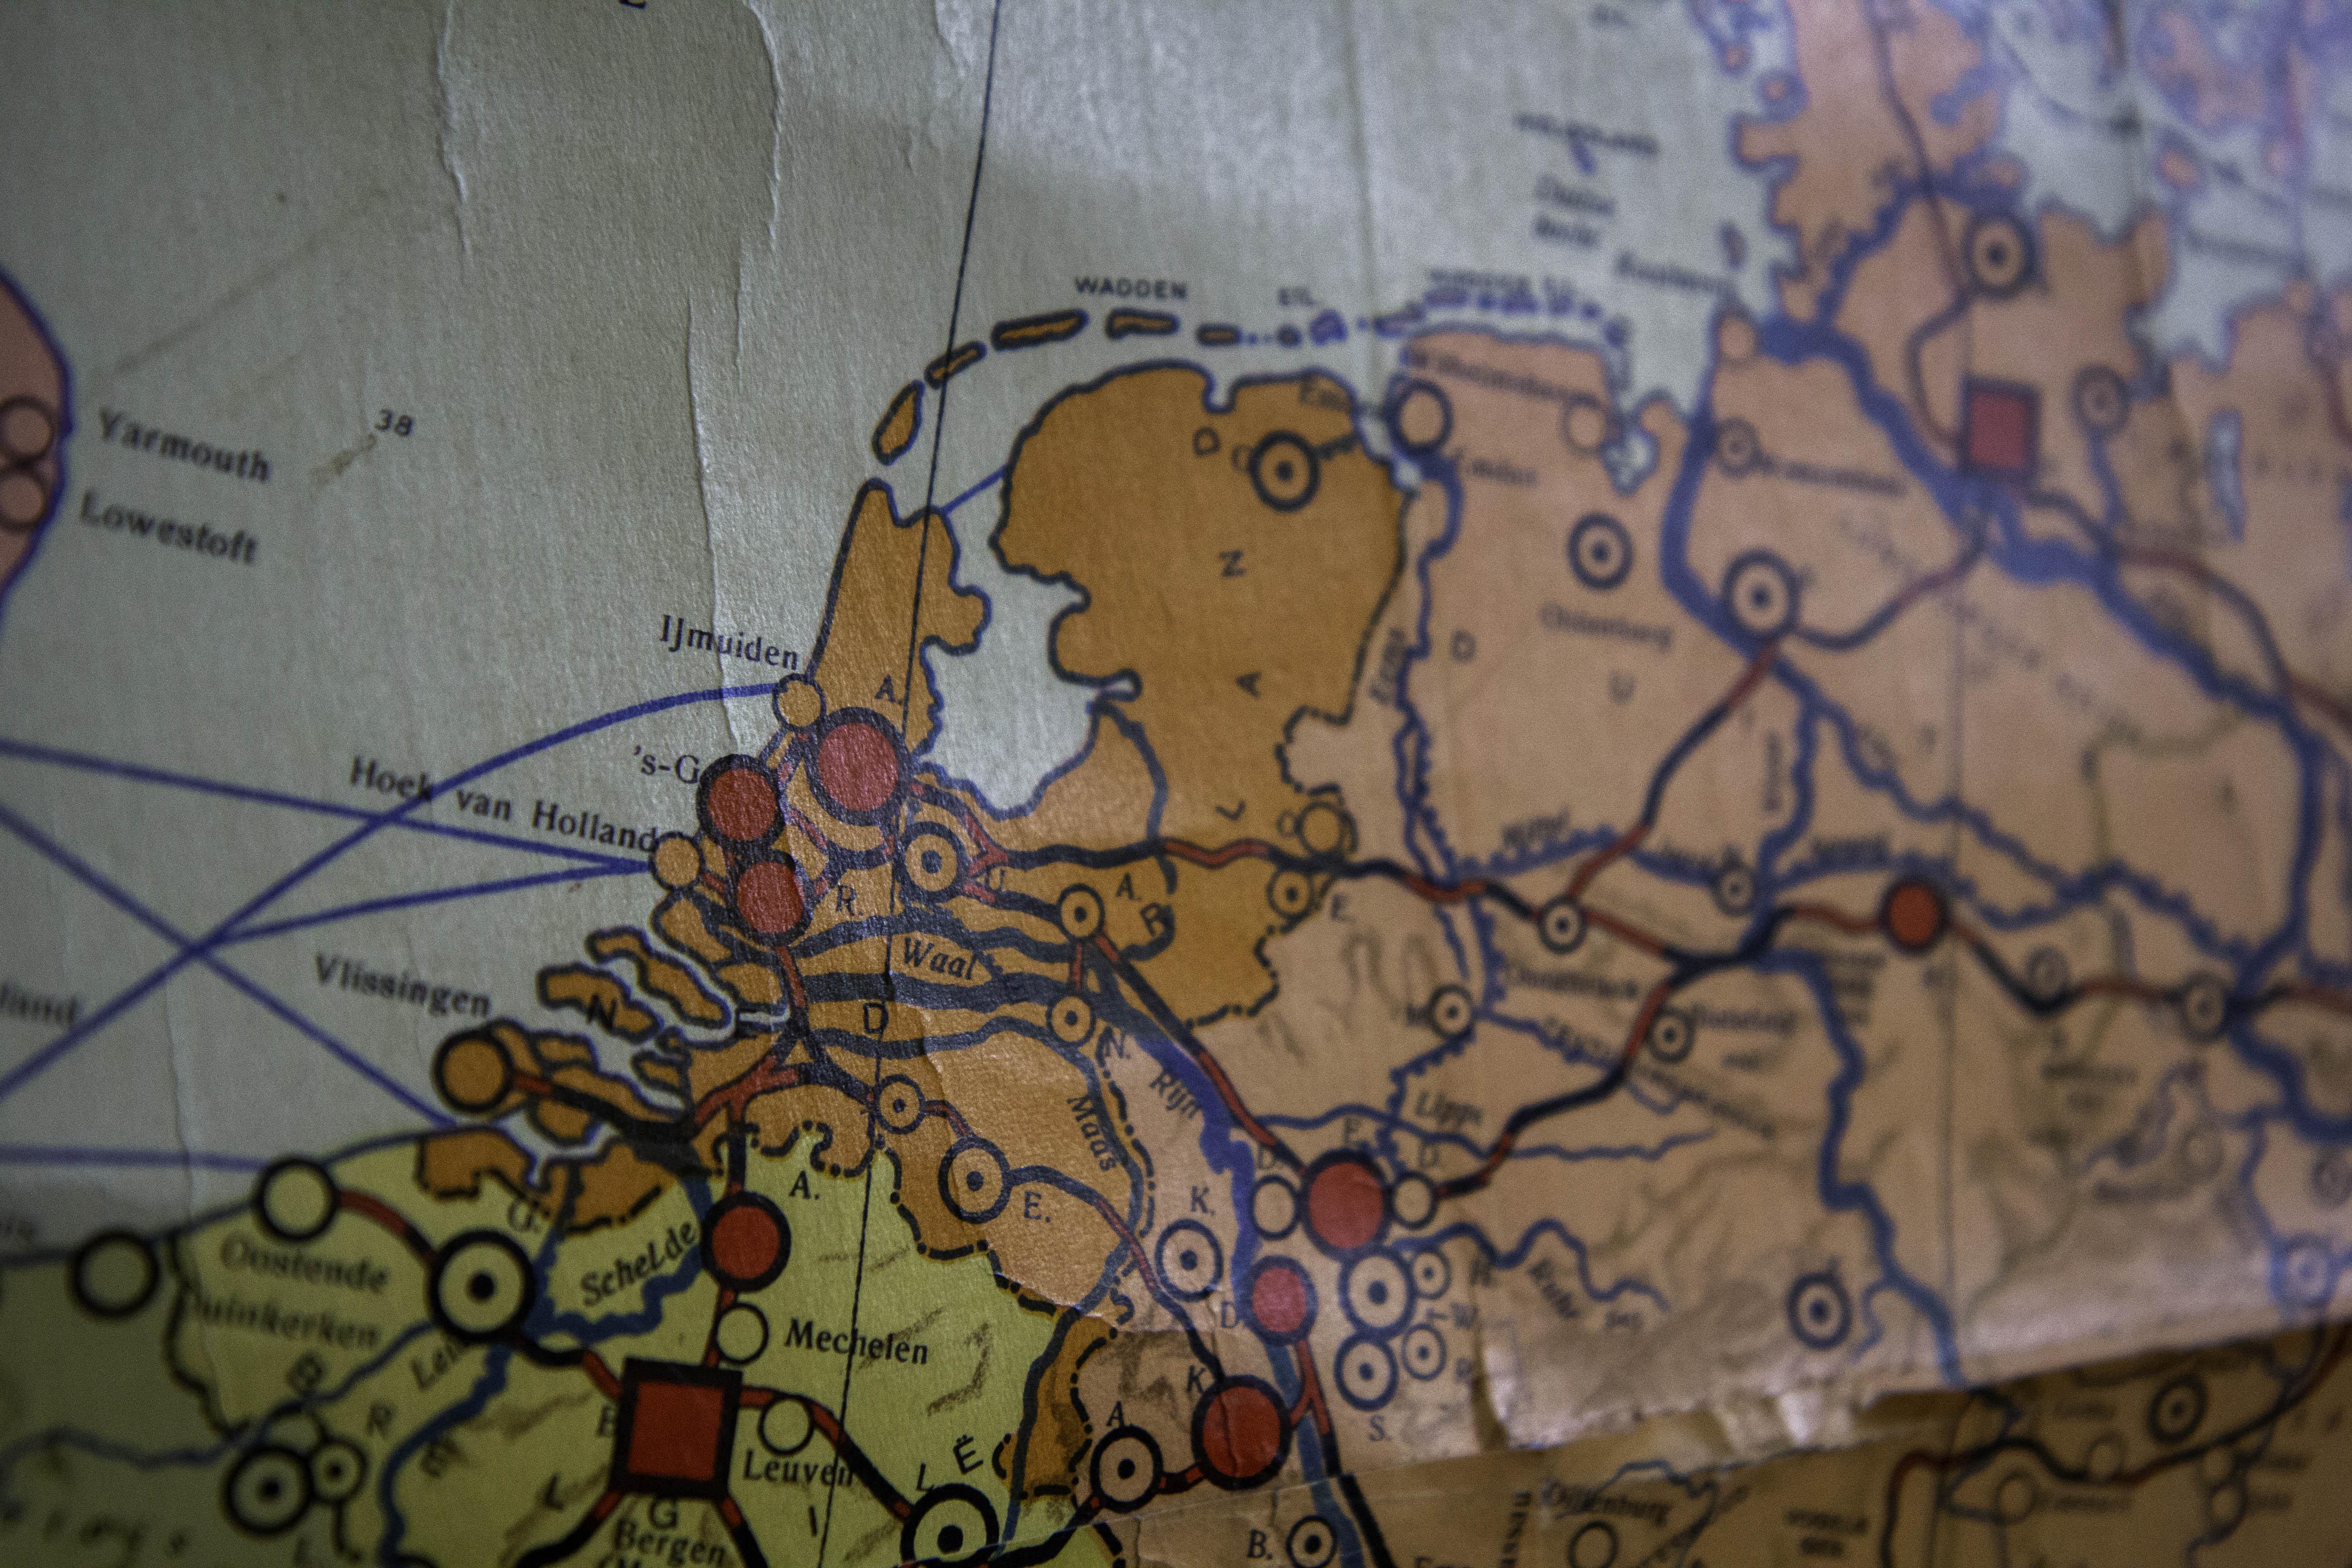 http://cafevrijdag.nl/wp-content/uploads/2019/08/landkaart.jpg